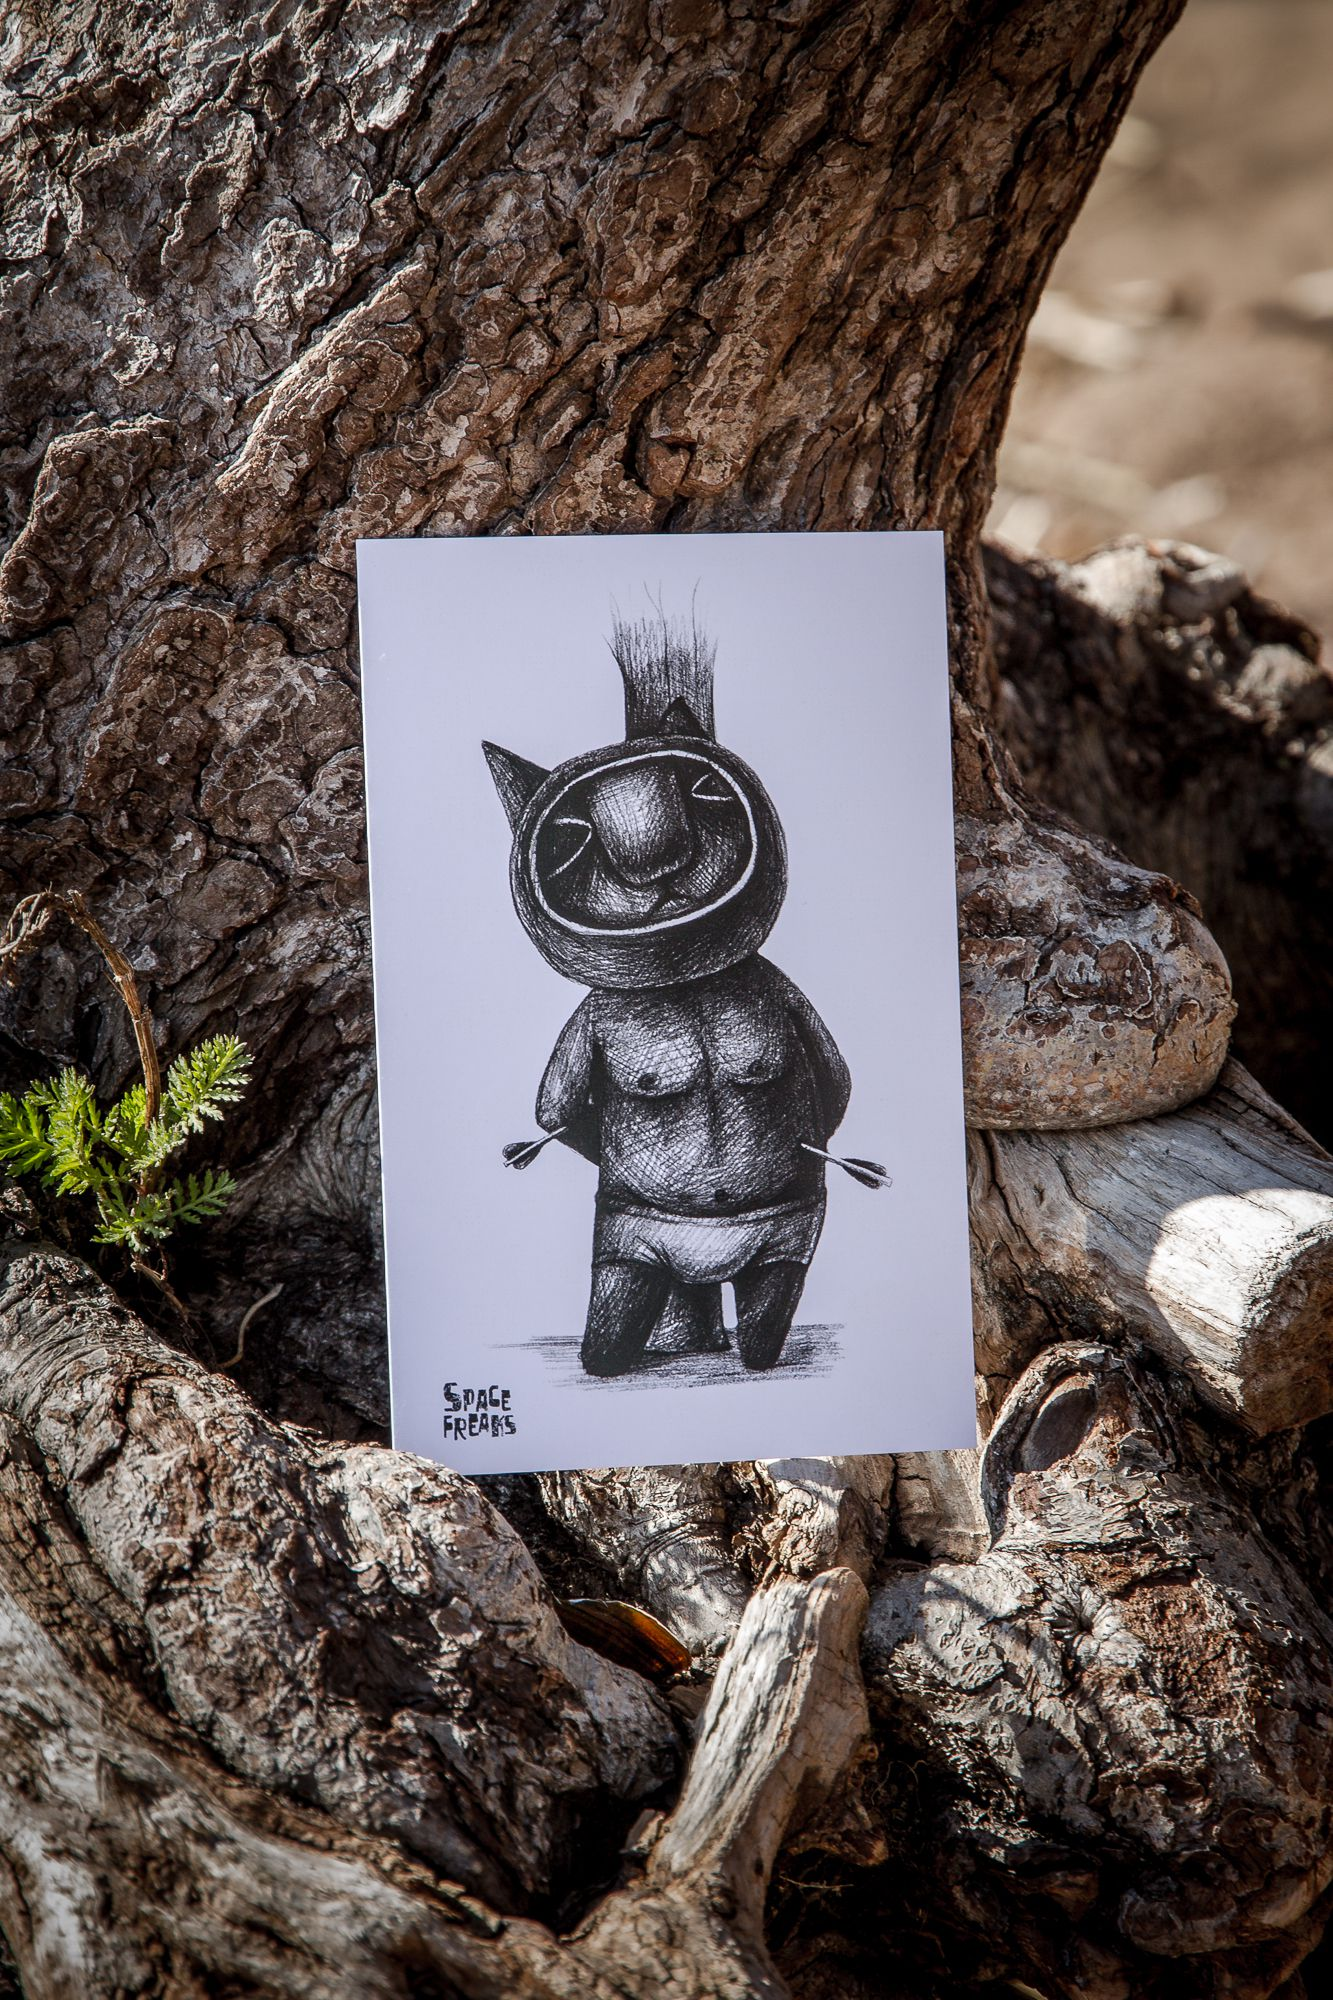 знаквнимания сюрприз gift card remembrance surprise spacefreaks открытка подарок